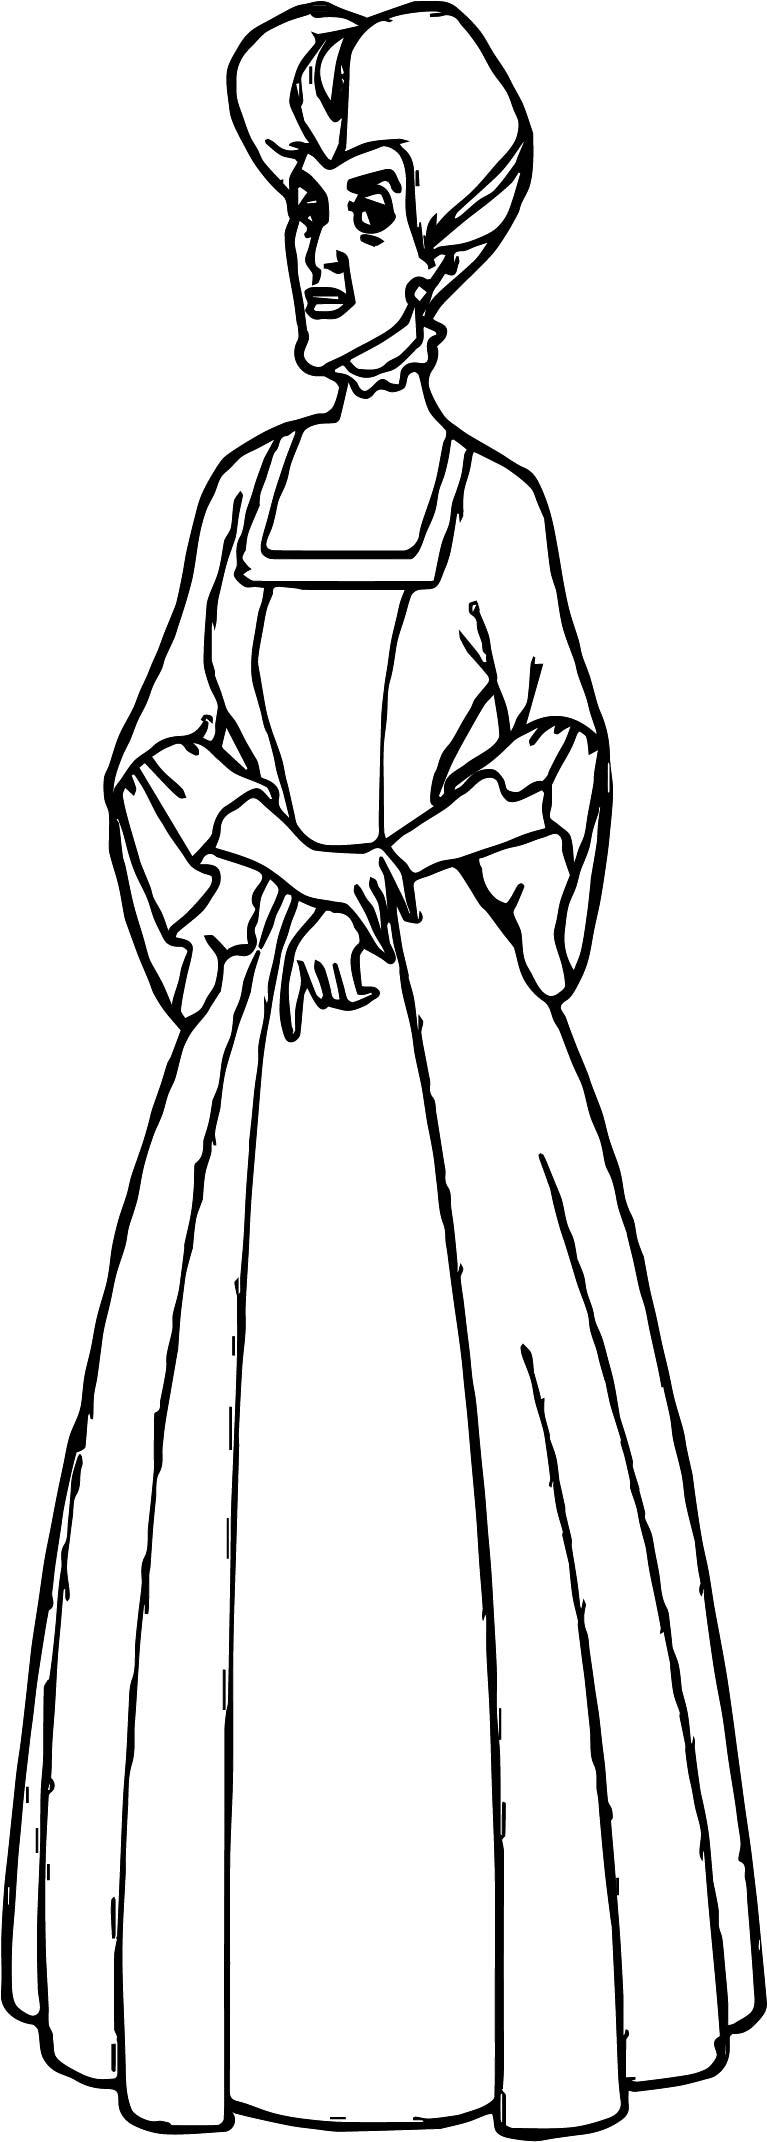 Anastasia Woman Coloring Page